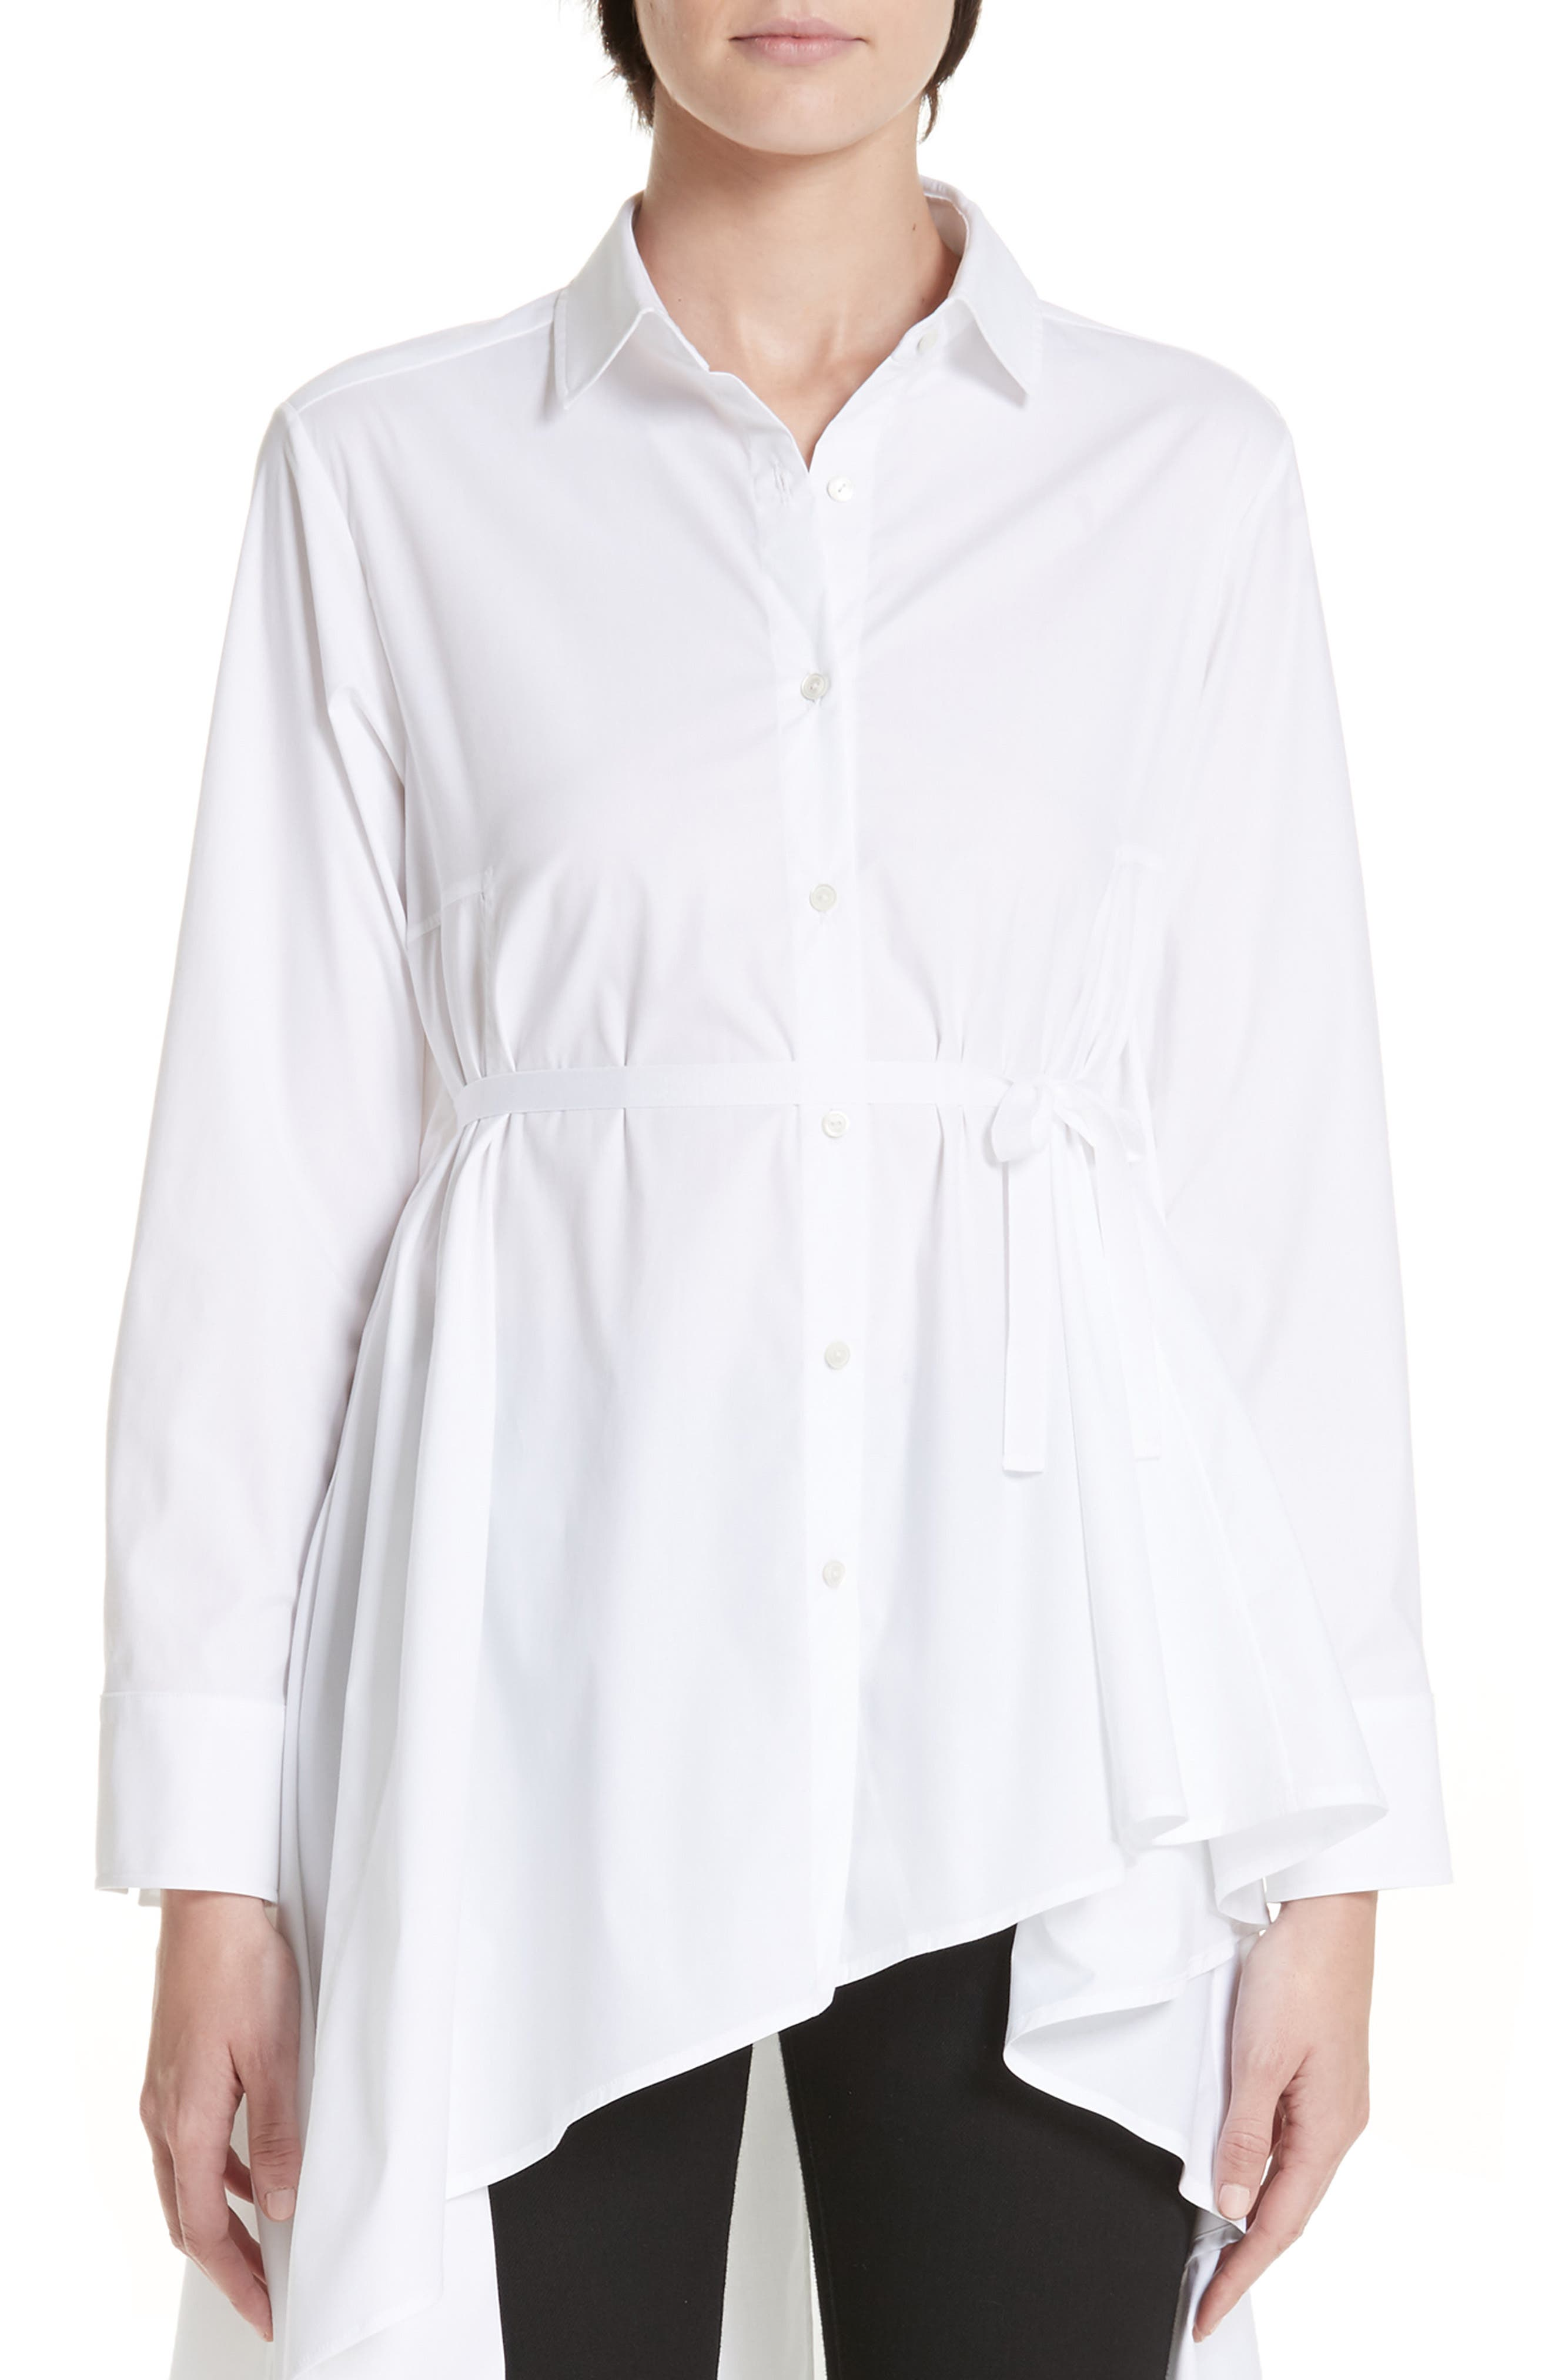 PALMER//HARDING Long Super Shirt in White